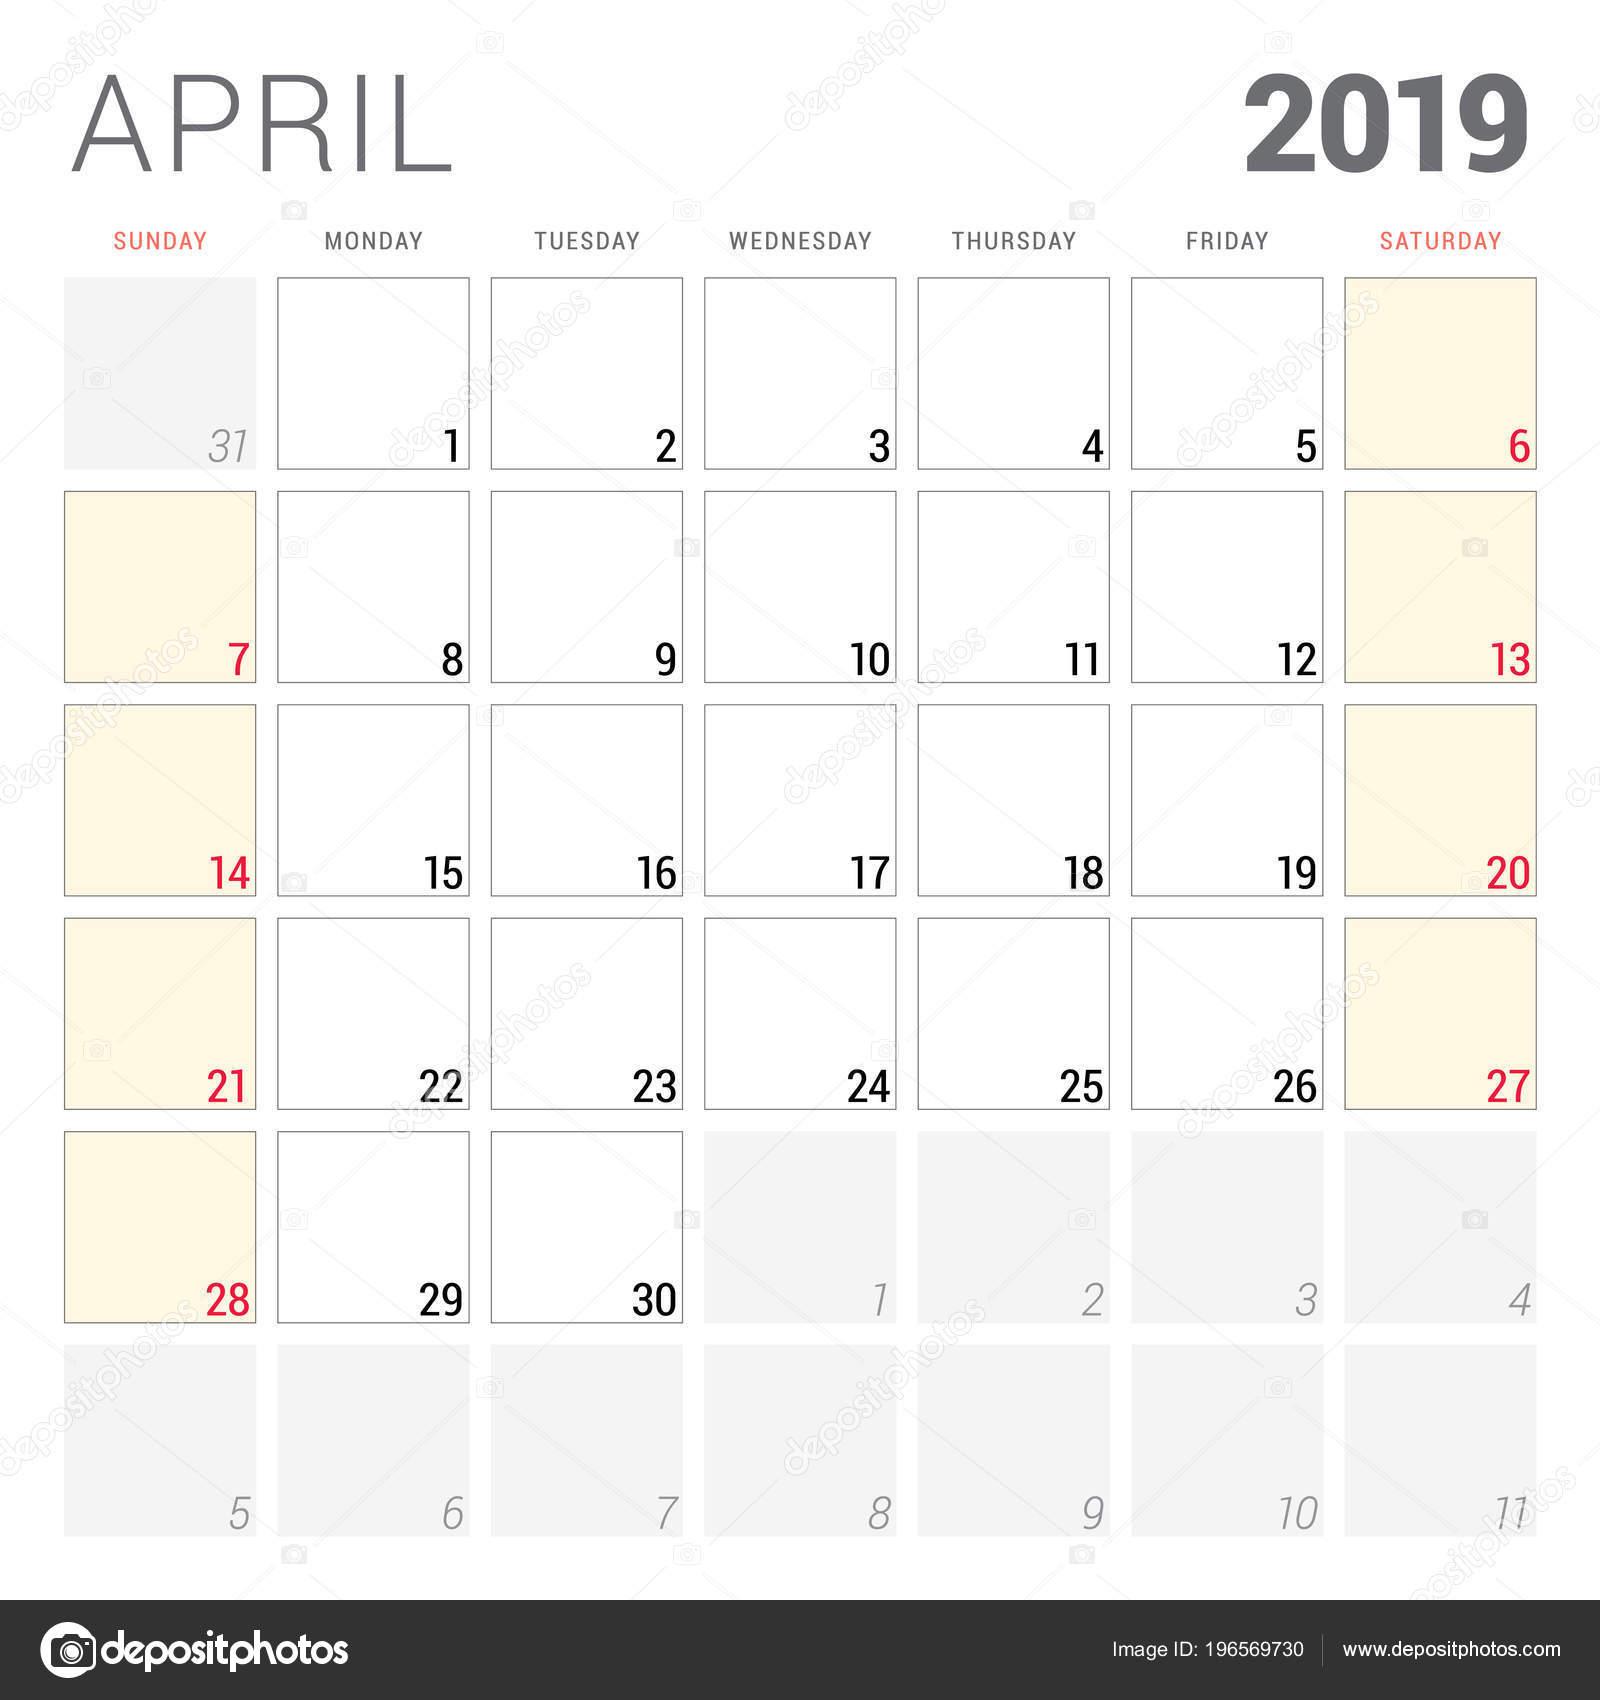 Calendario Imprimir Abril 2019.Planificador Calendario Para Abril 2019 Semana Comienza Domingo